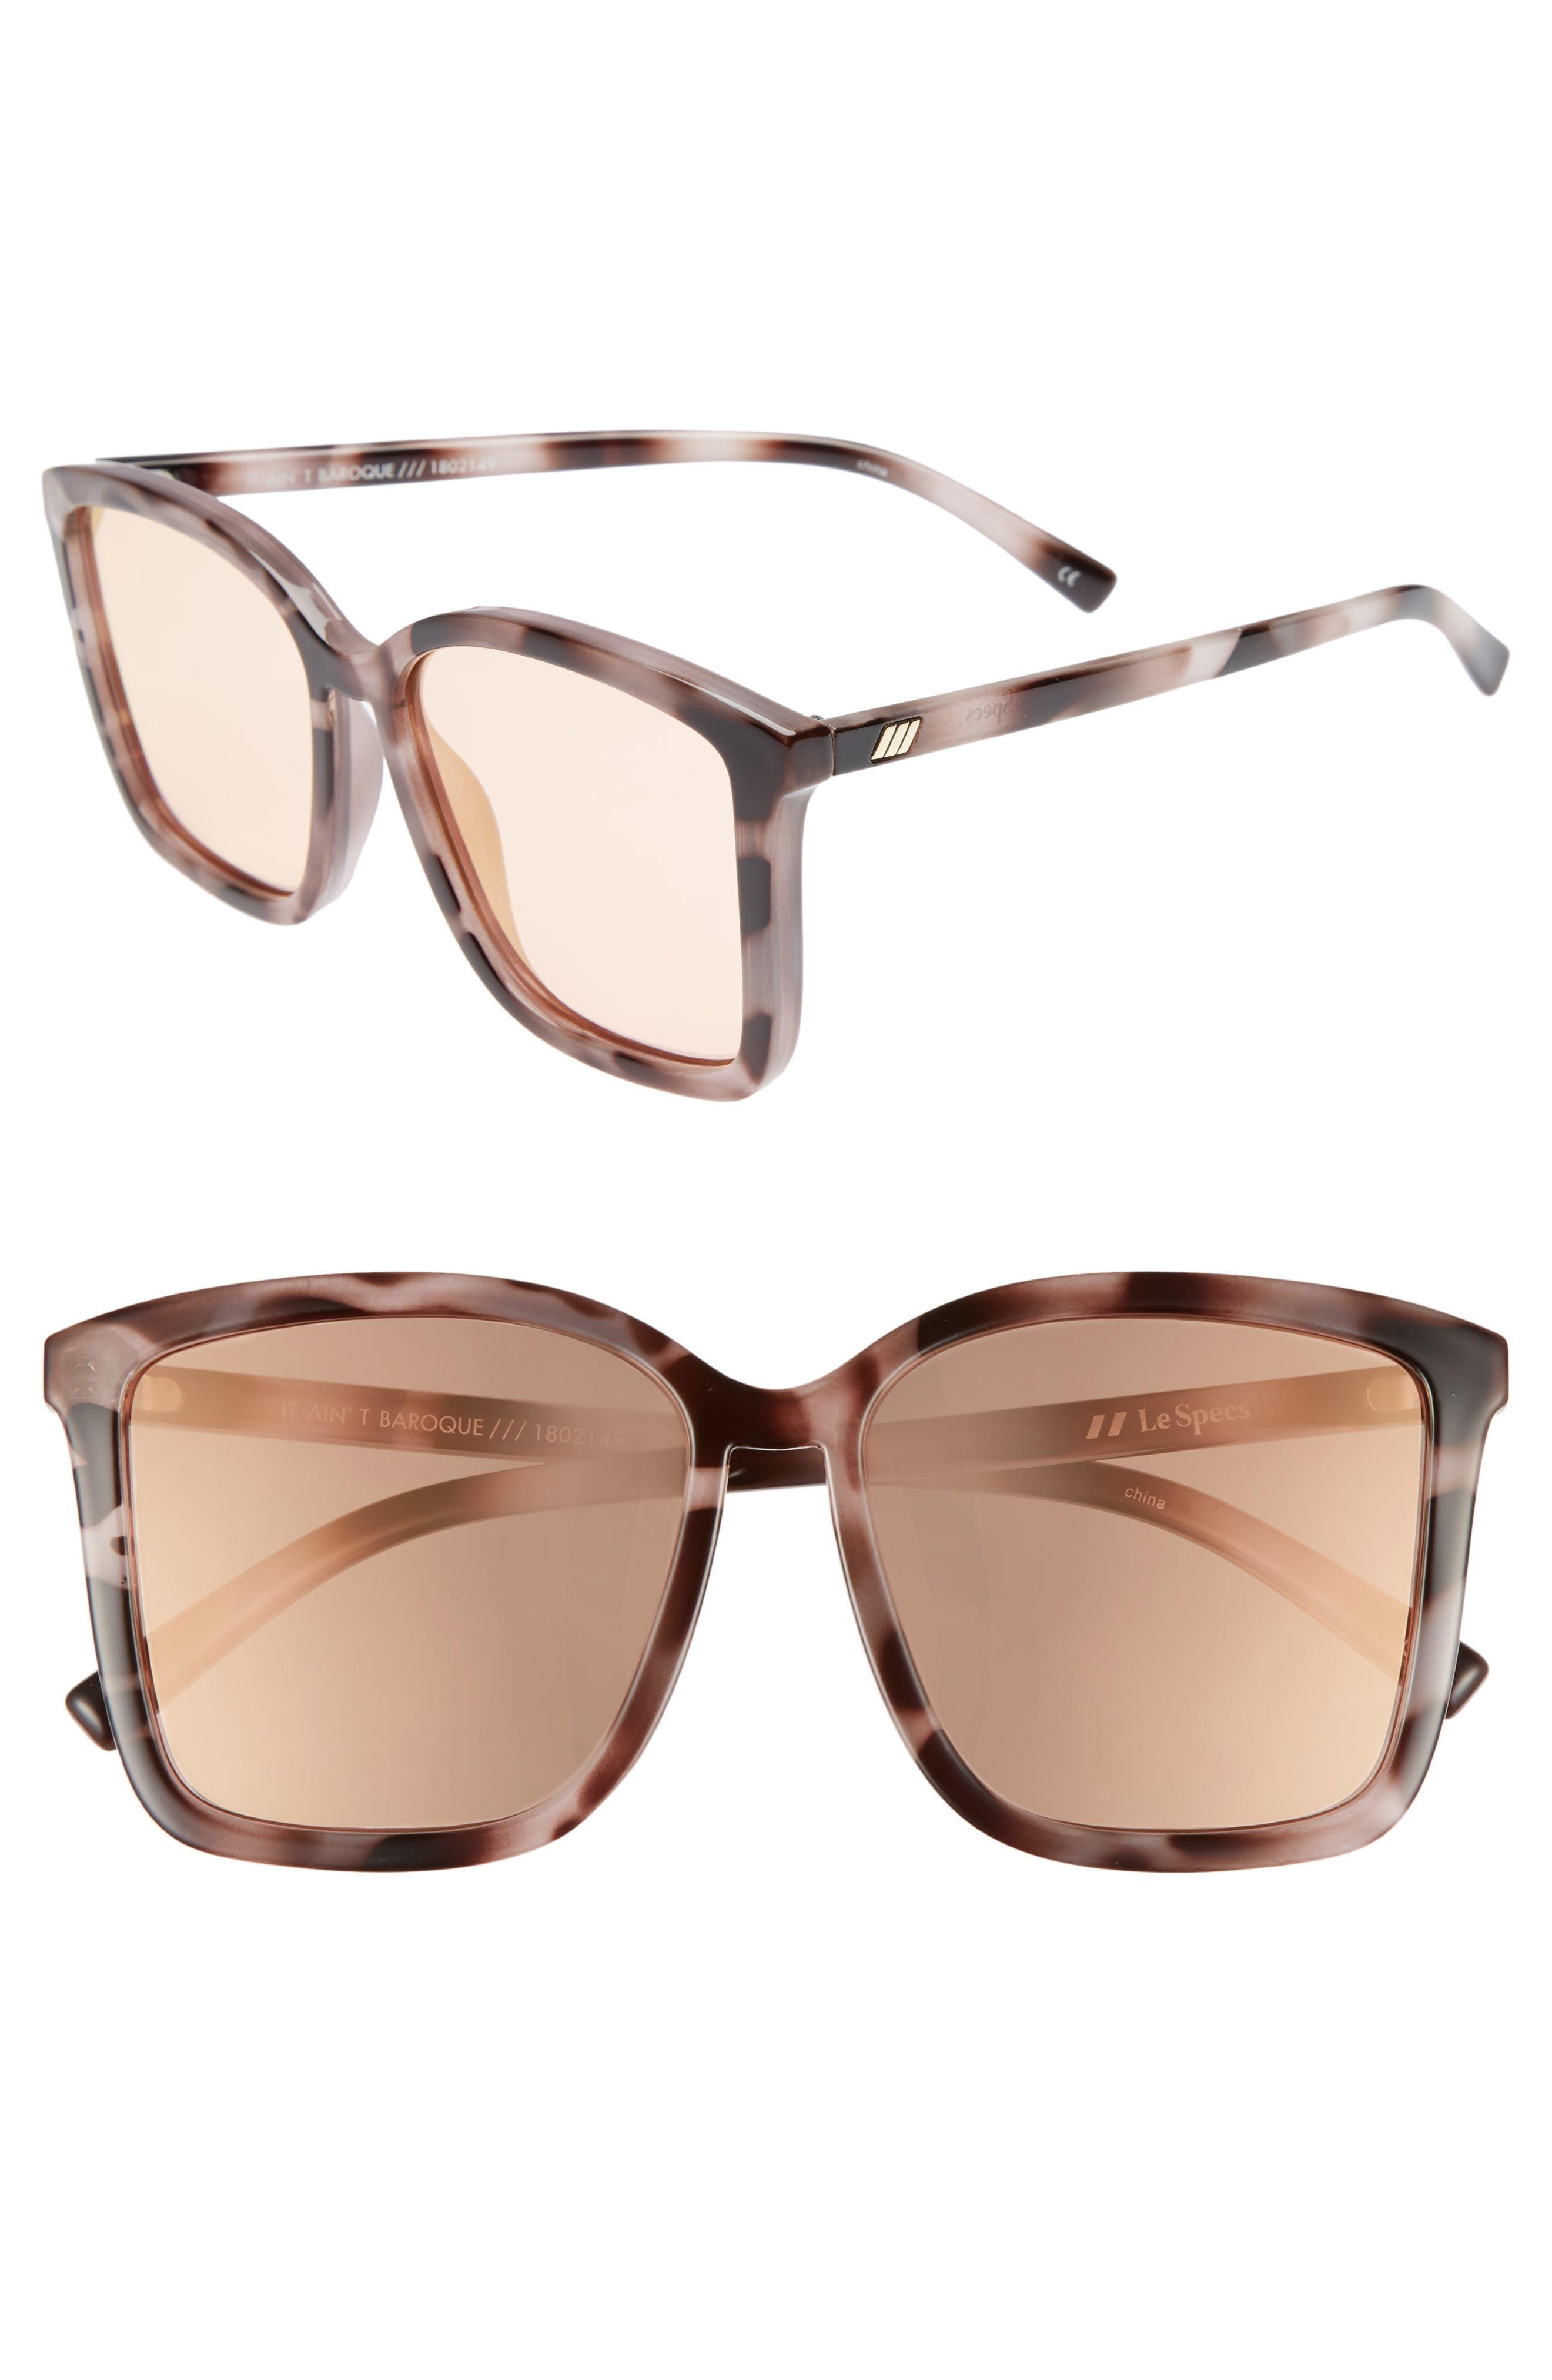 It Ain't Baroque 55mm Sunglasses,                             Main thumbnail 1, color,                             APRICOT TORT